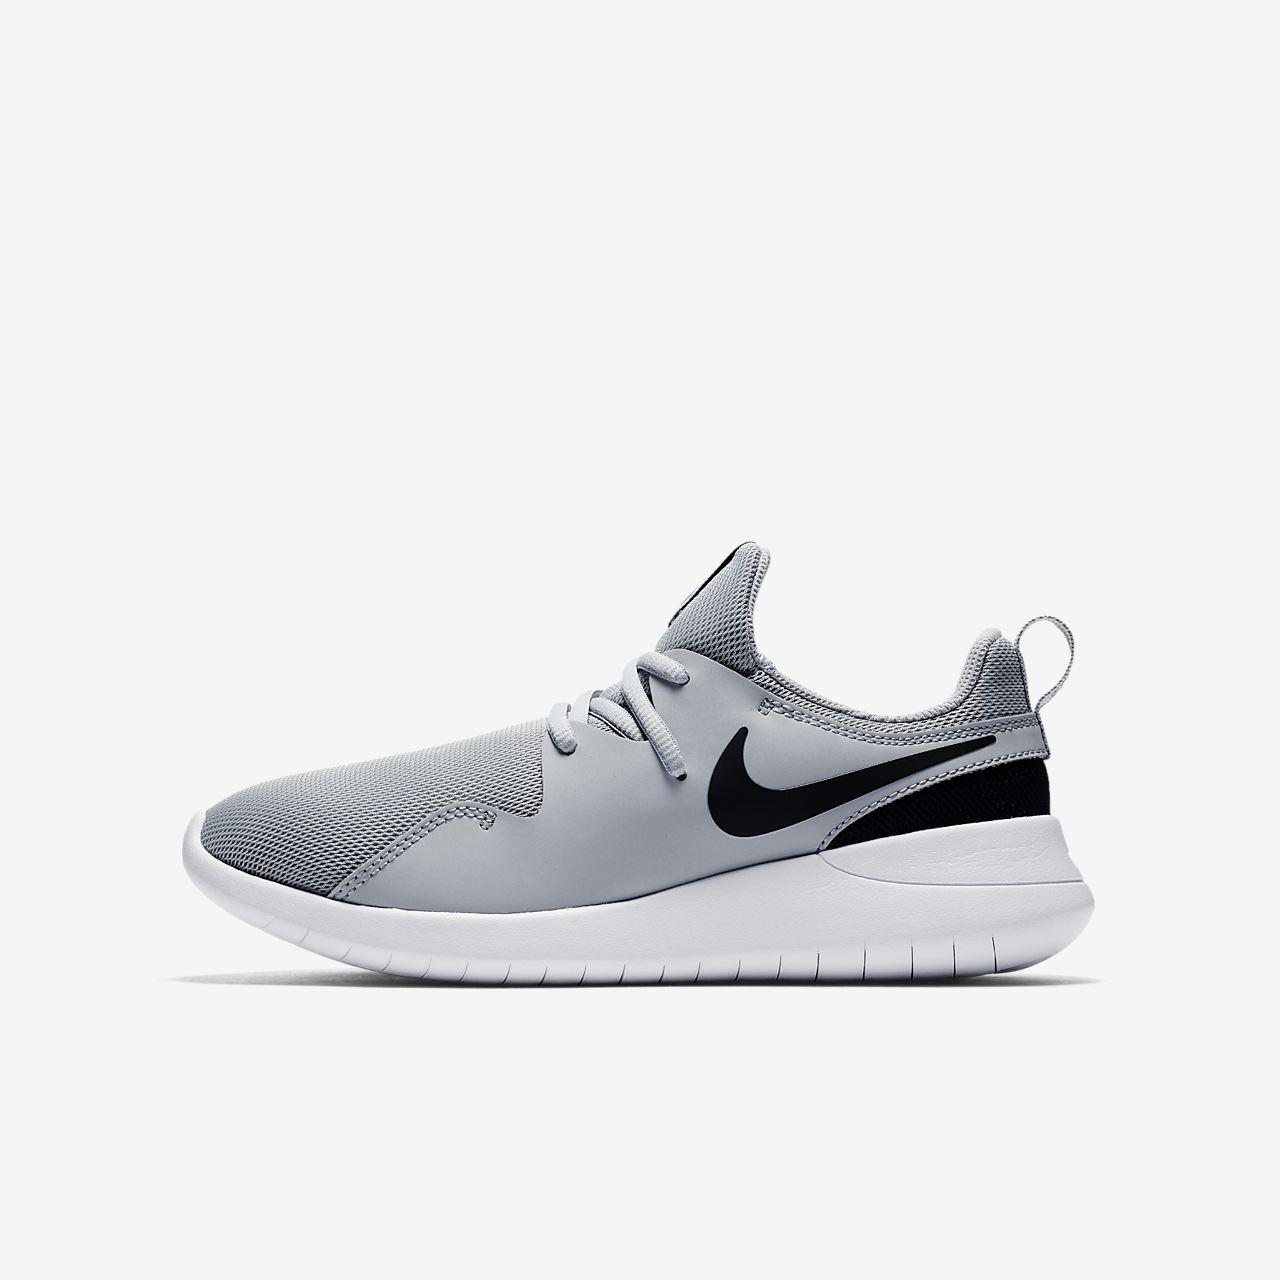 4d5c9f7d8a1 Nike Tessen Older Kids  Shoe. Nike.com GB